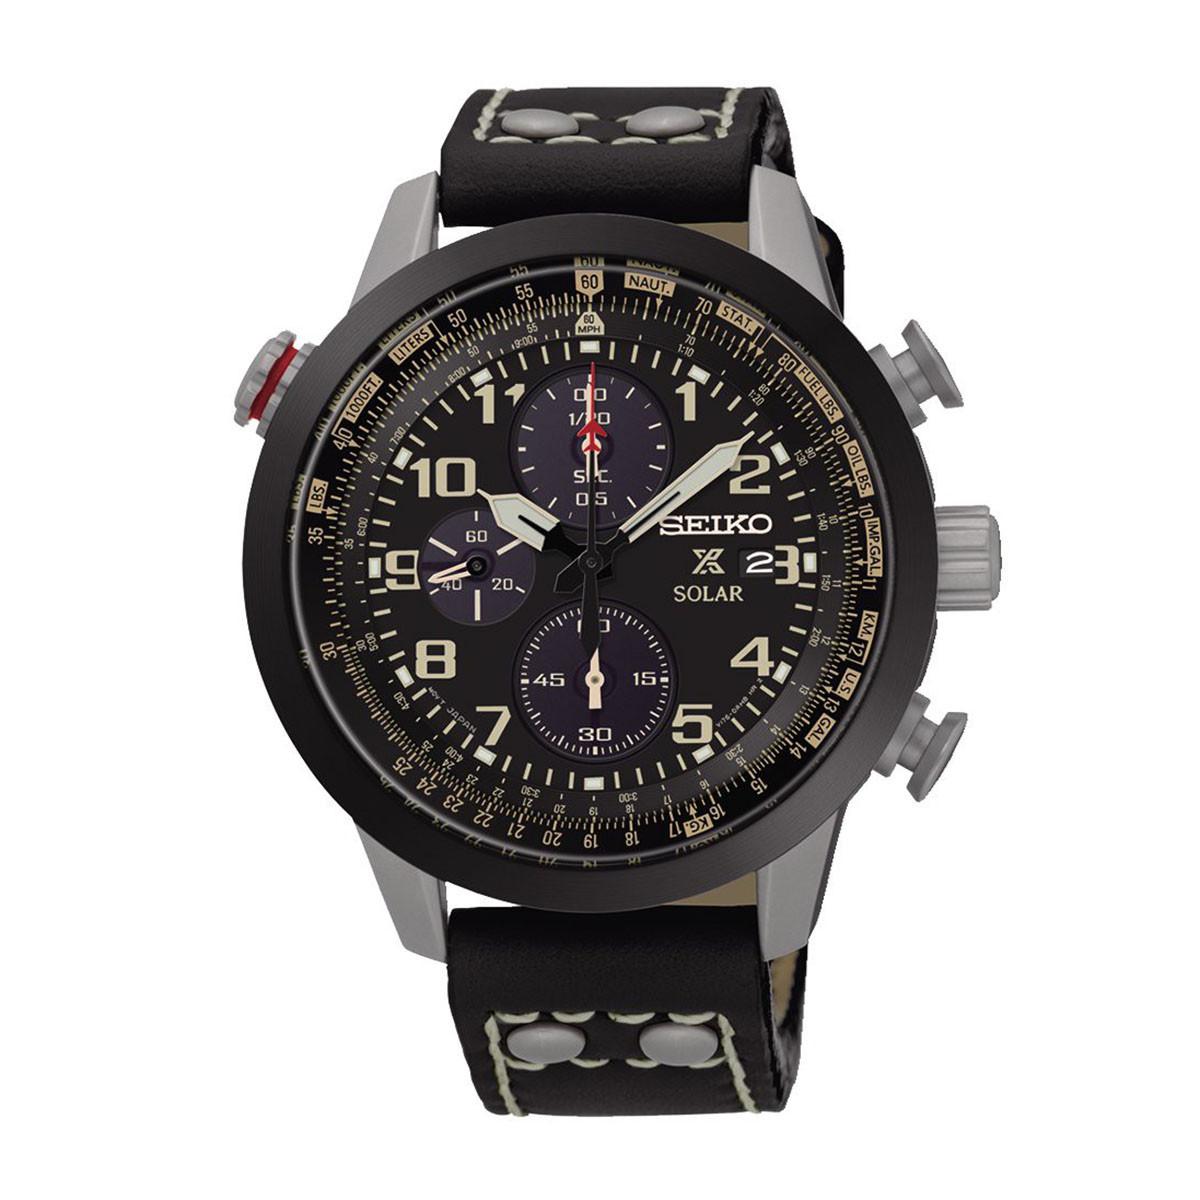 Часы Seiko Prospex Aviator SSC423P1 хронограф SOLAR